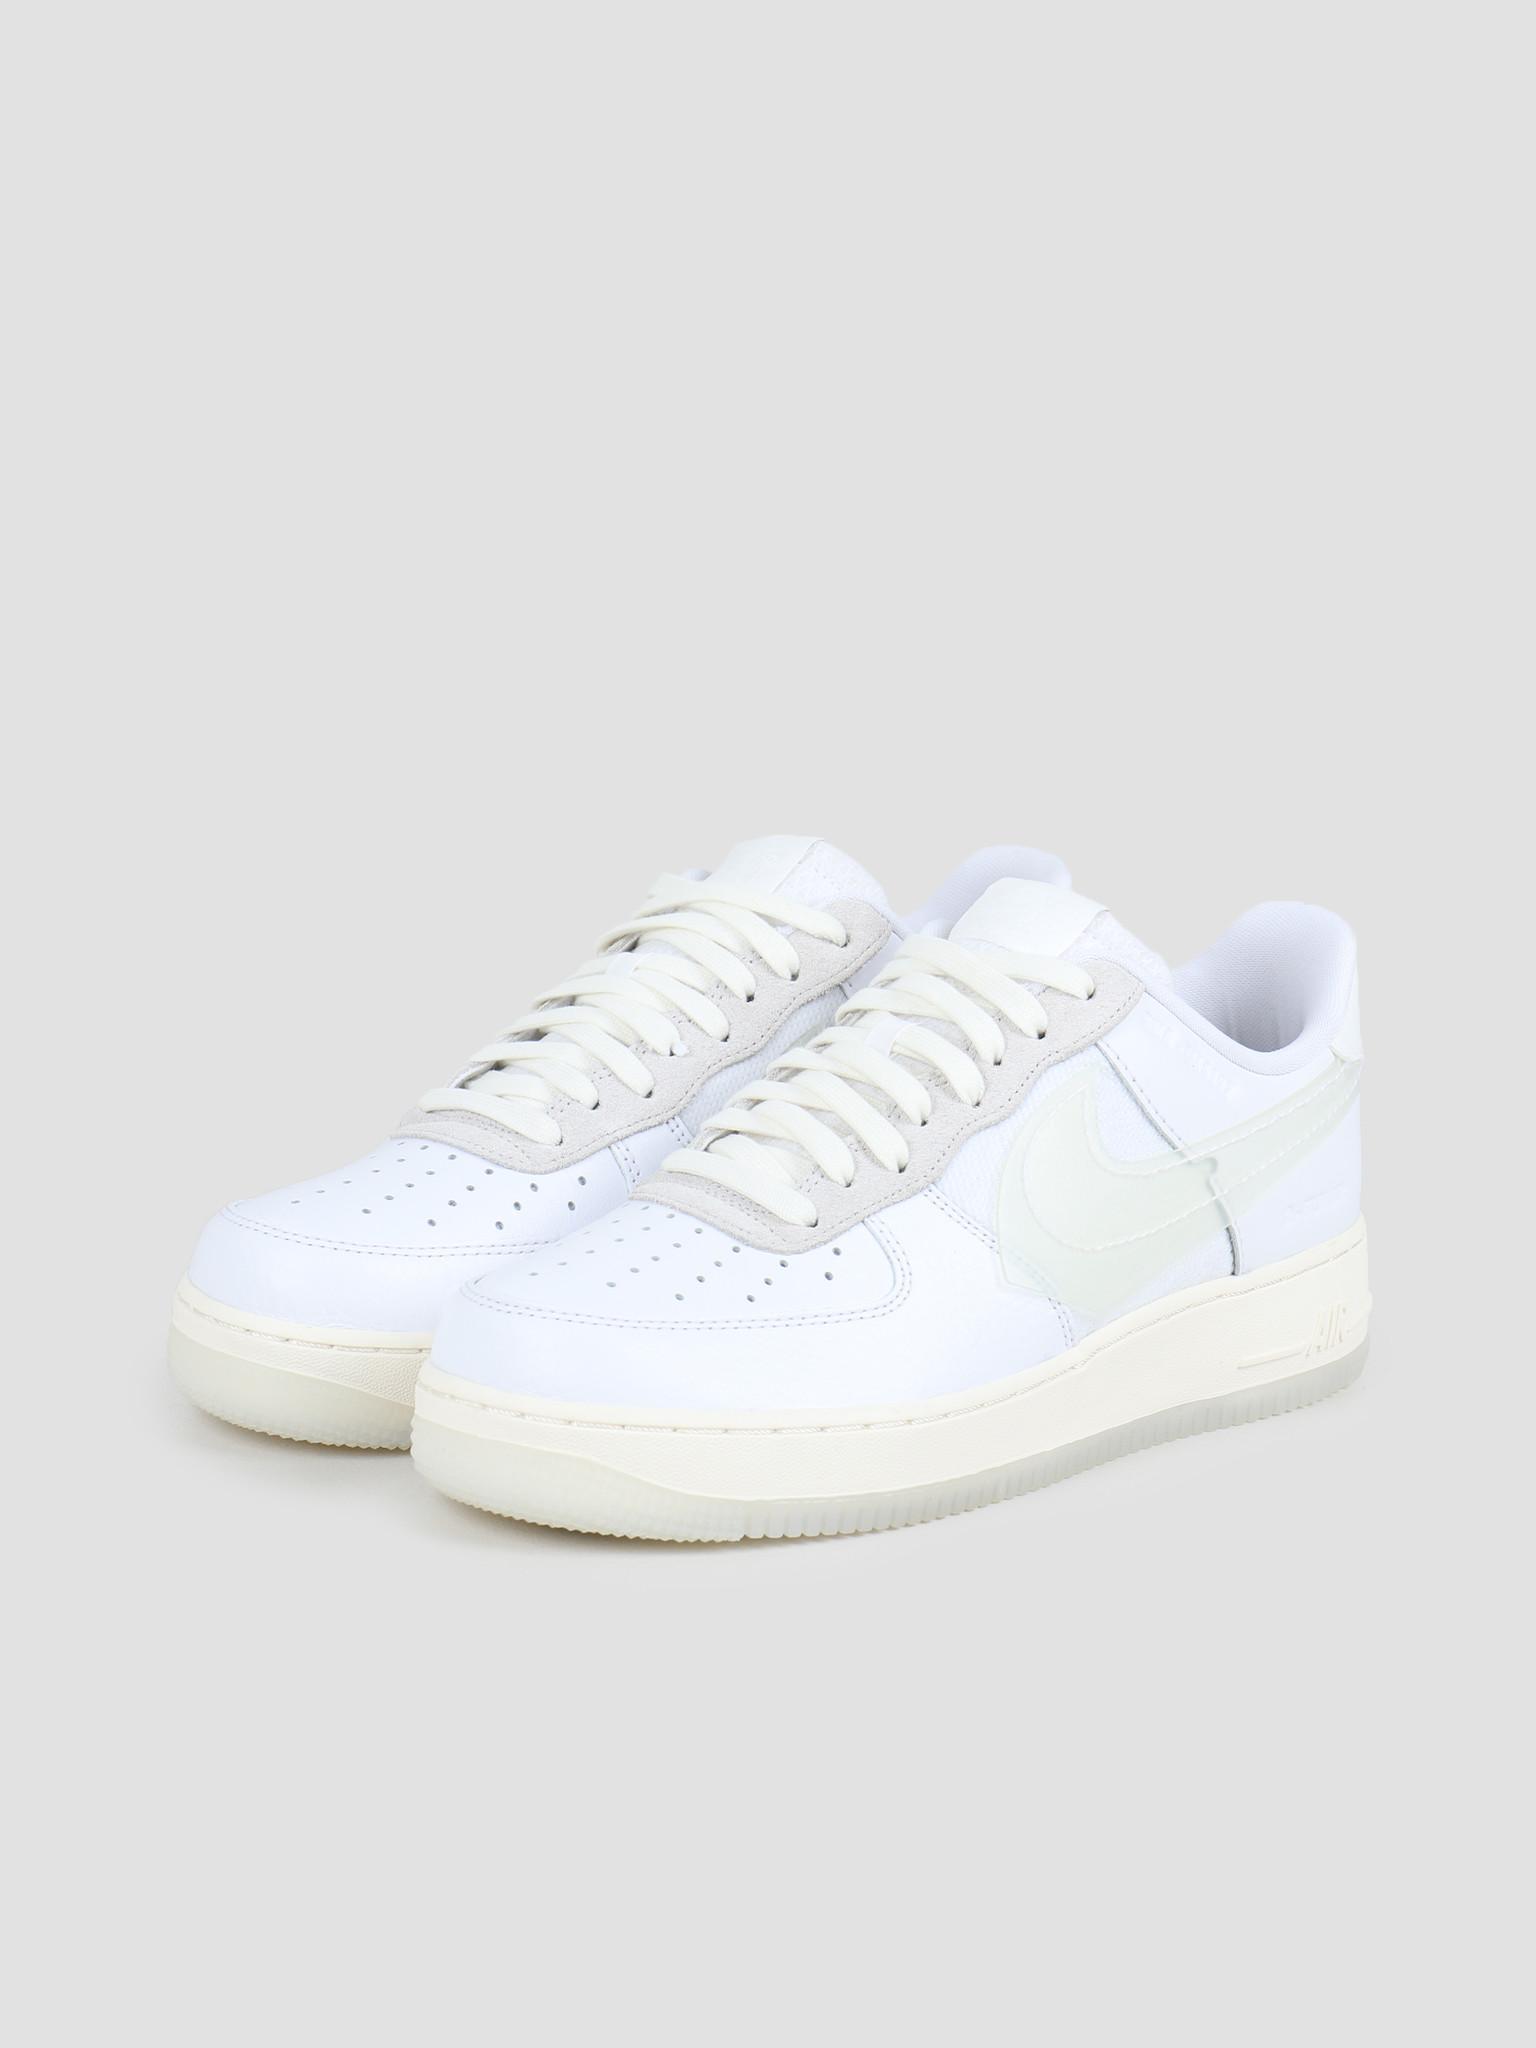 Nike Nike Air Force 1 Lv8 White White Sail Black CV3040-100